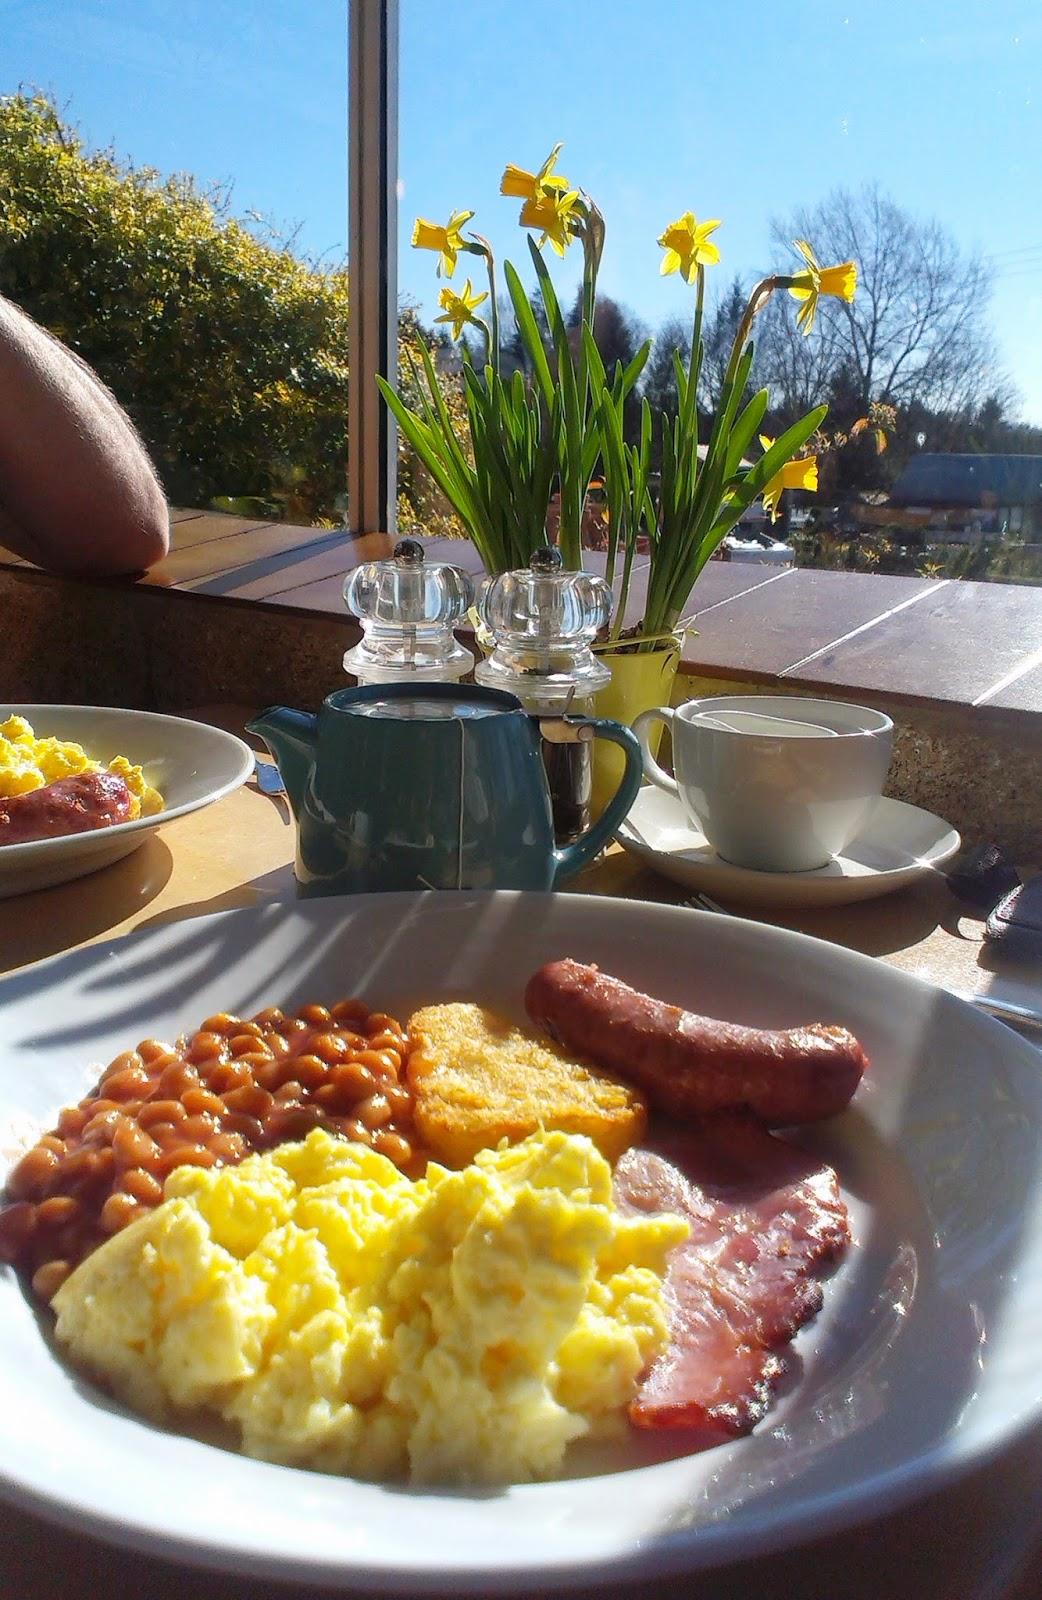 Breakfast in the sunshine at Whitehall Garden Centre